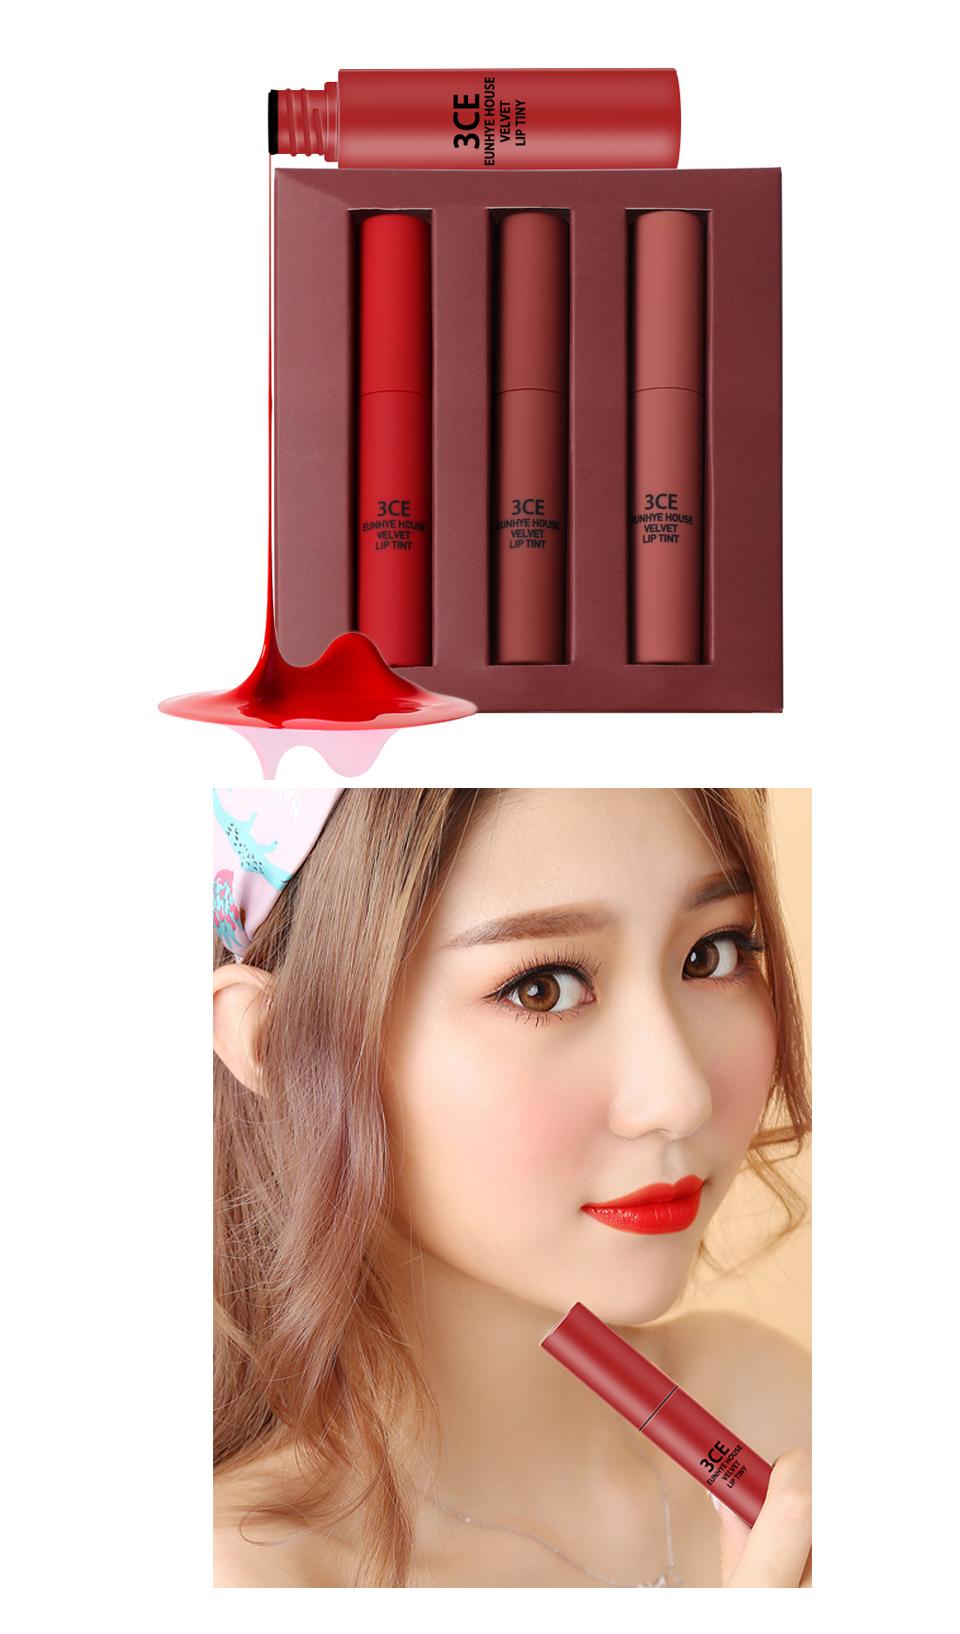 3CE Eunhye House Brand New Lip Cosmetics 3 colors Lip glaze Moisturizer Long-lasting Lip Makeup for common 11